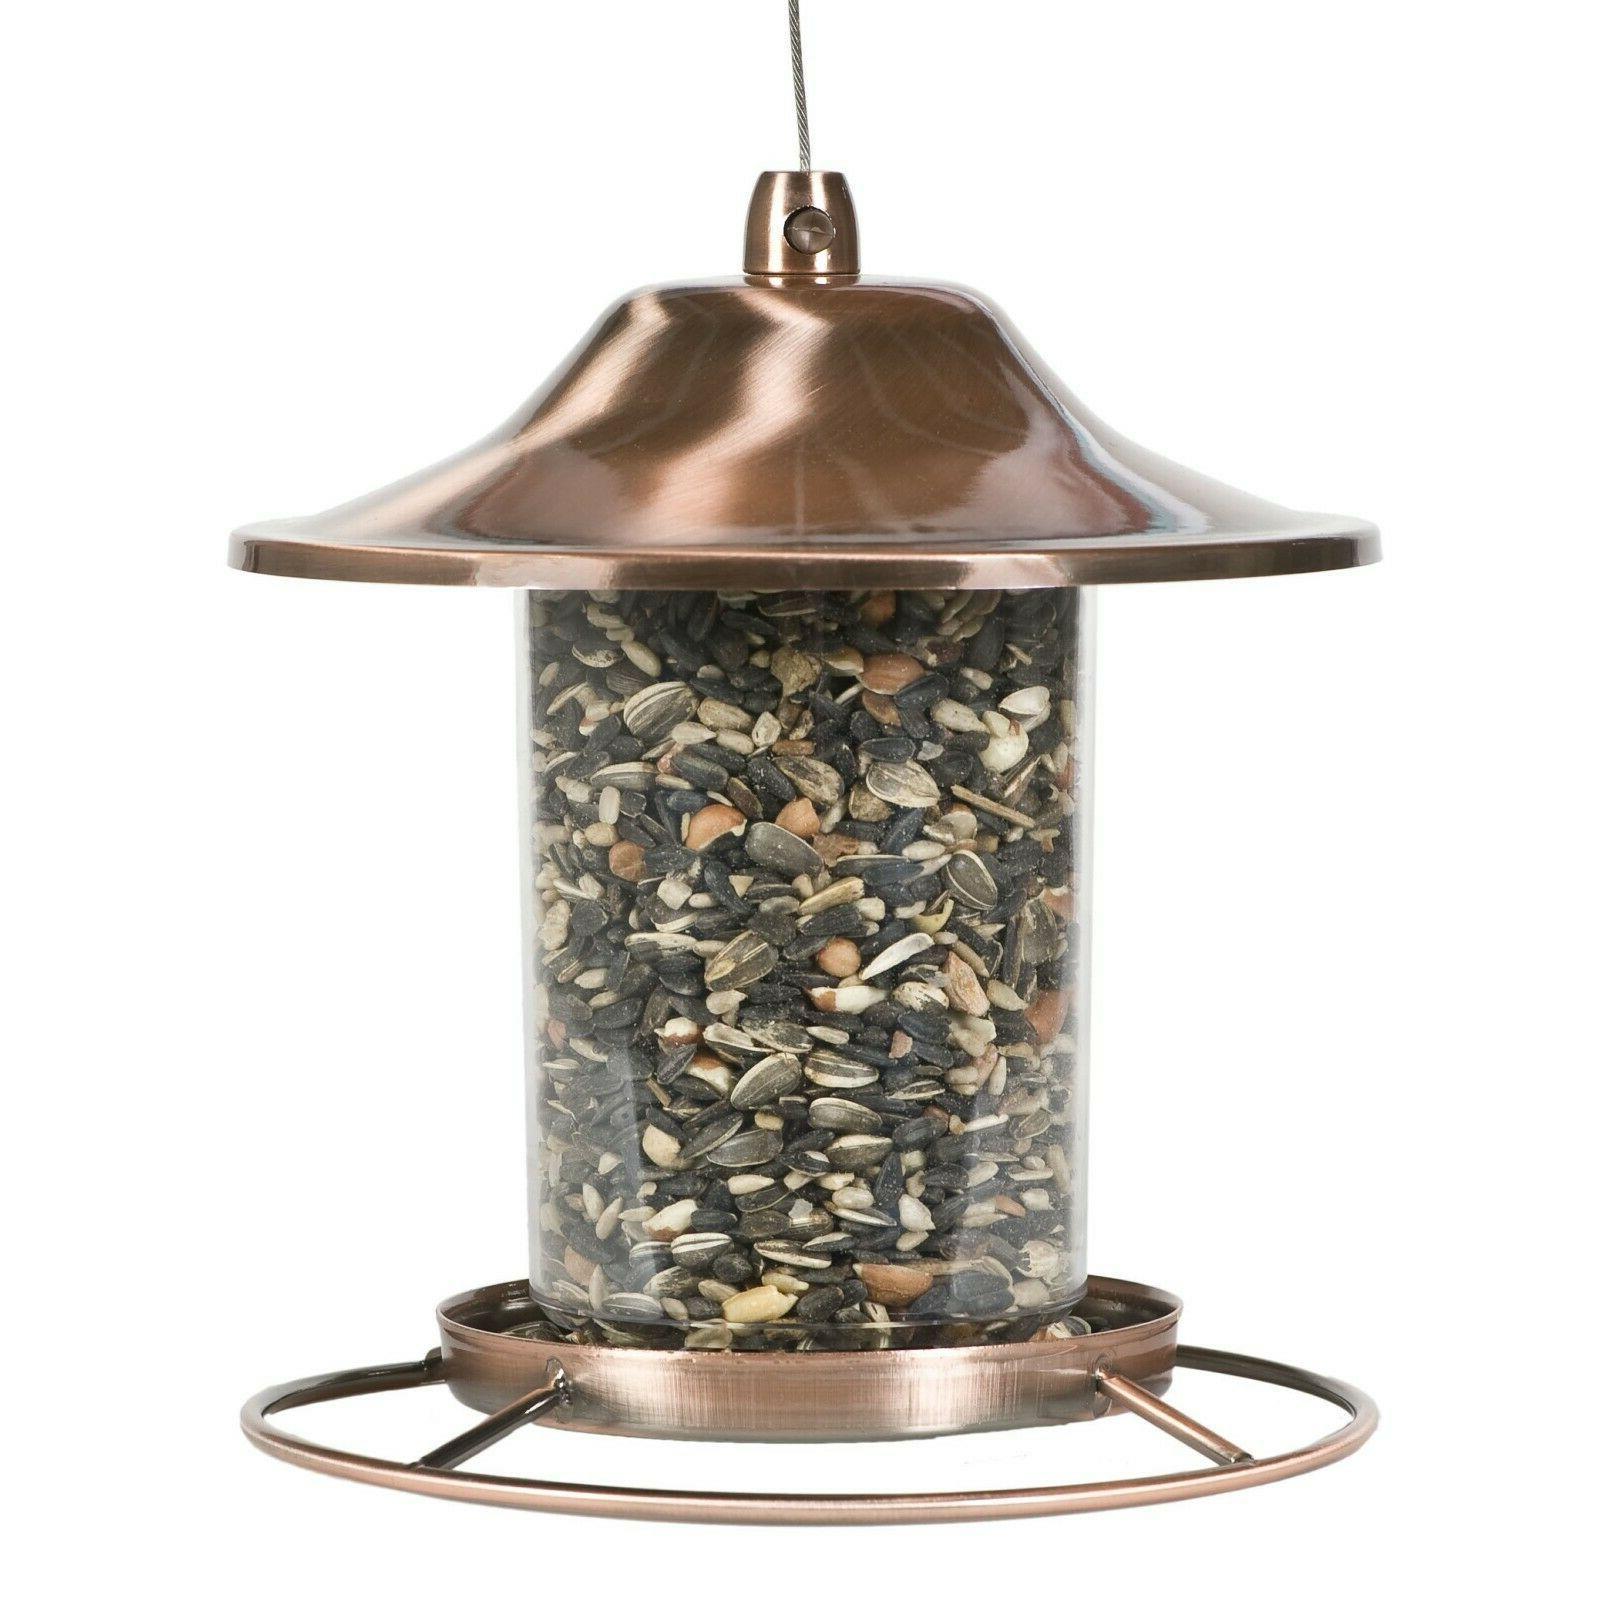 2 Lb Garden Seed Food Feed Dispenser Birdfeeder Perch